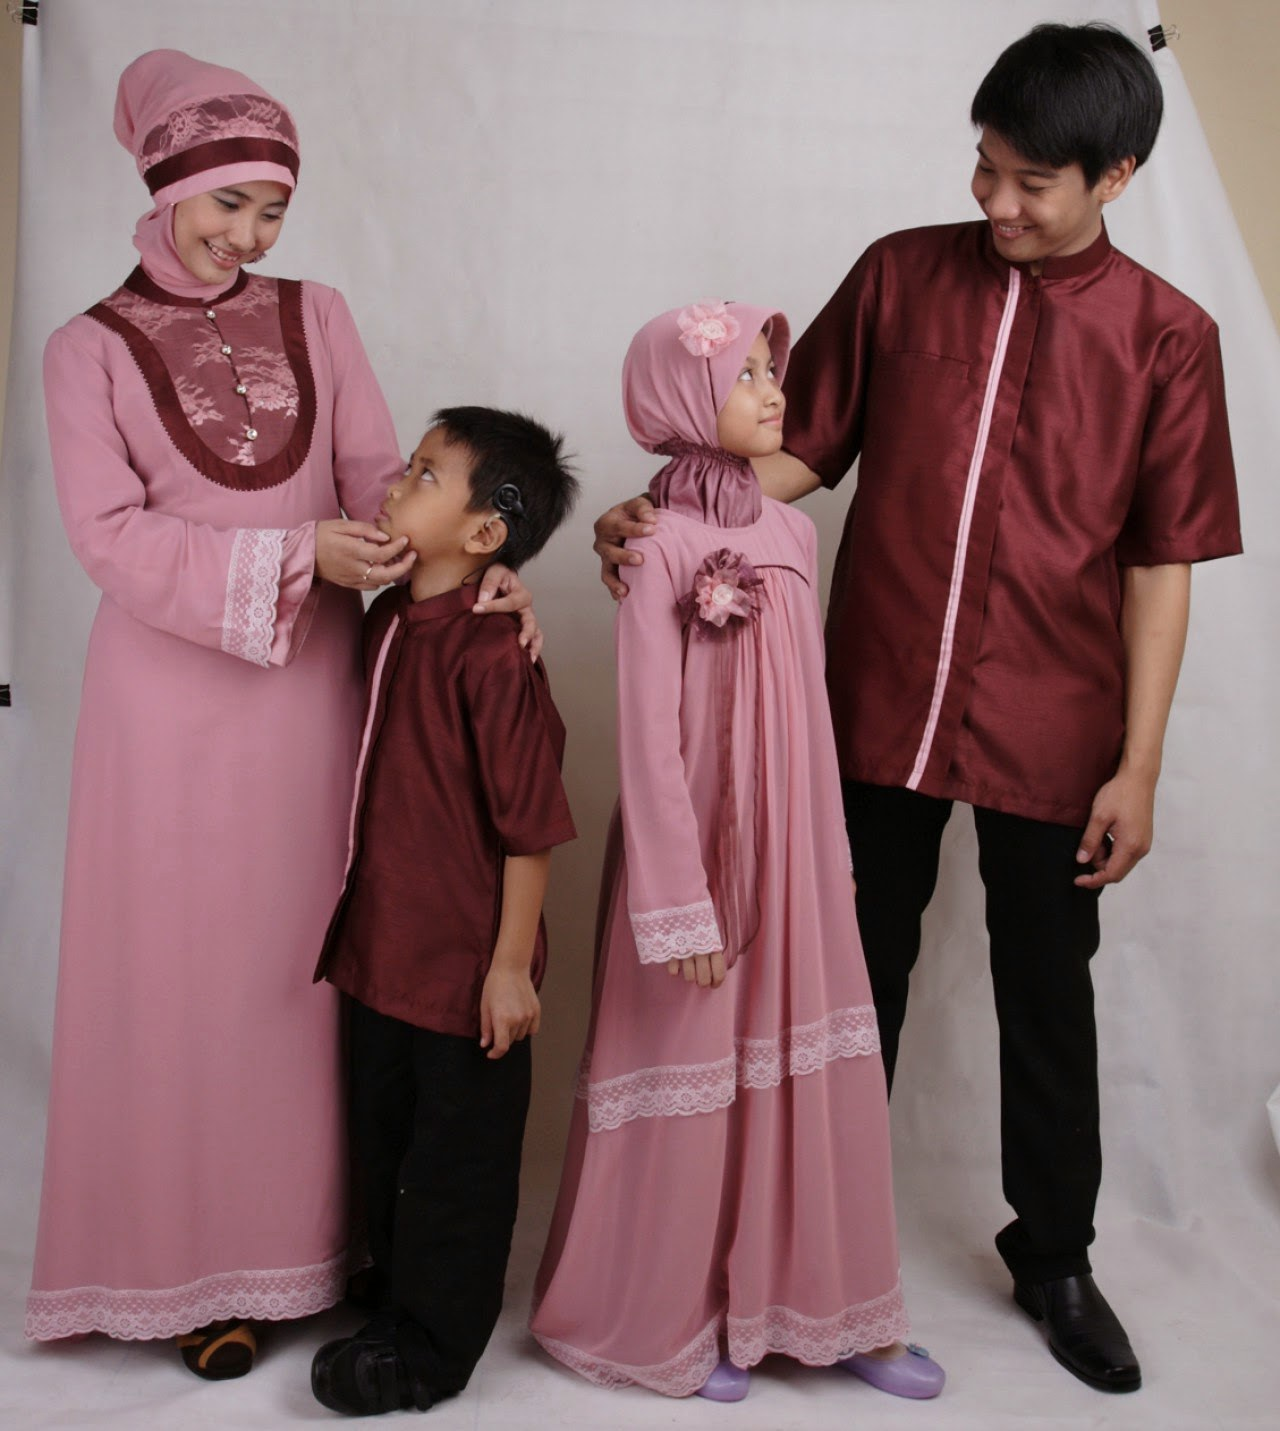 Bentuk Gambar Baju Lebaran Keluarga Ipdd Model Baju Keluarga Muslim Seragam Kembar Terbaru 2018